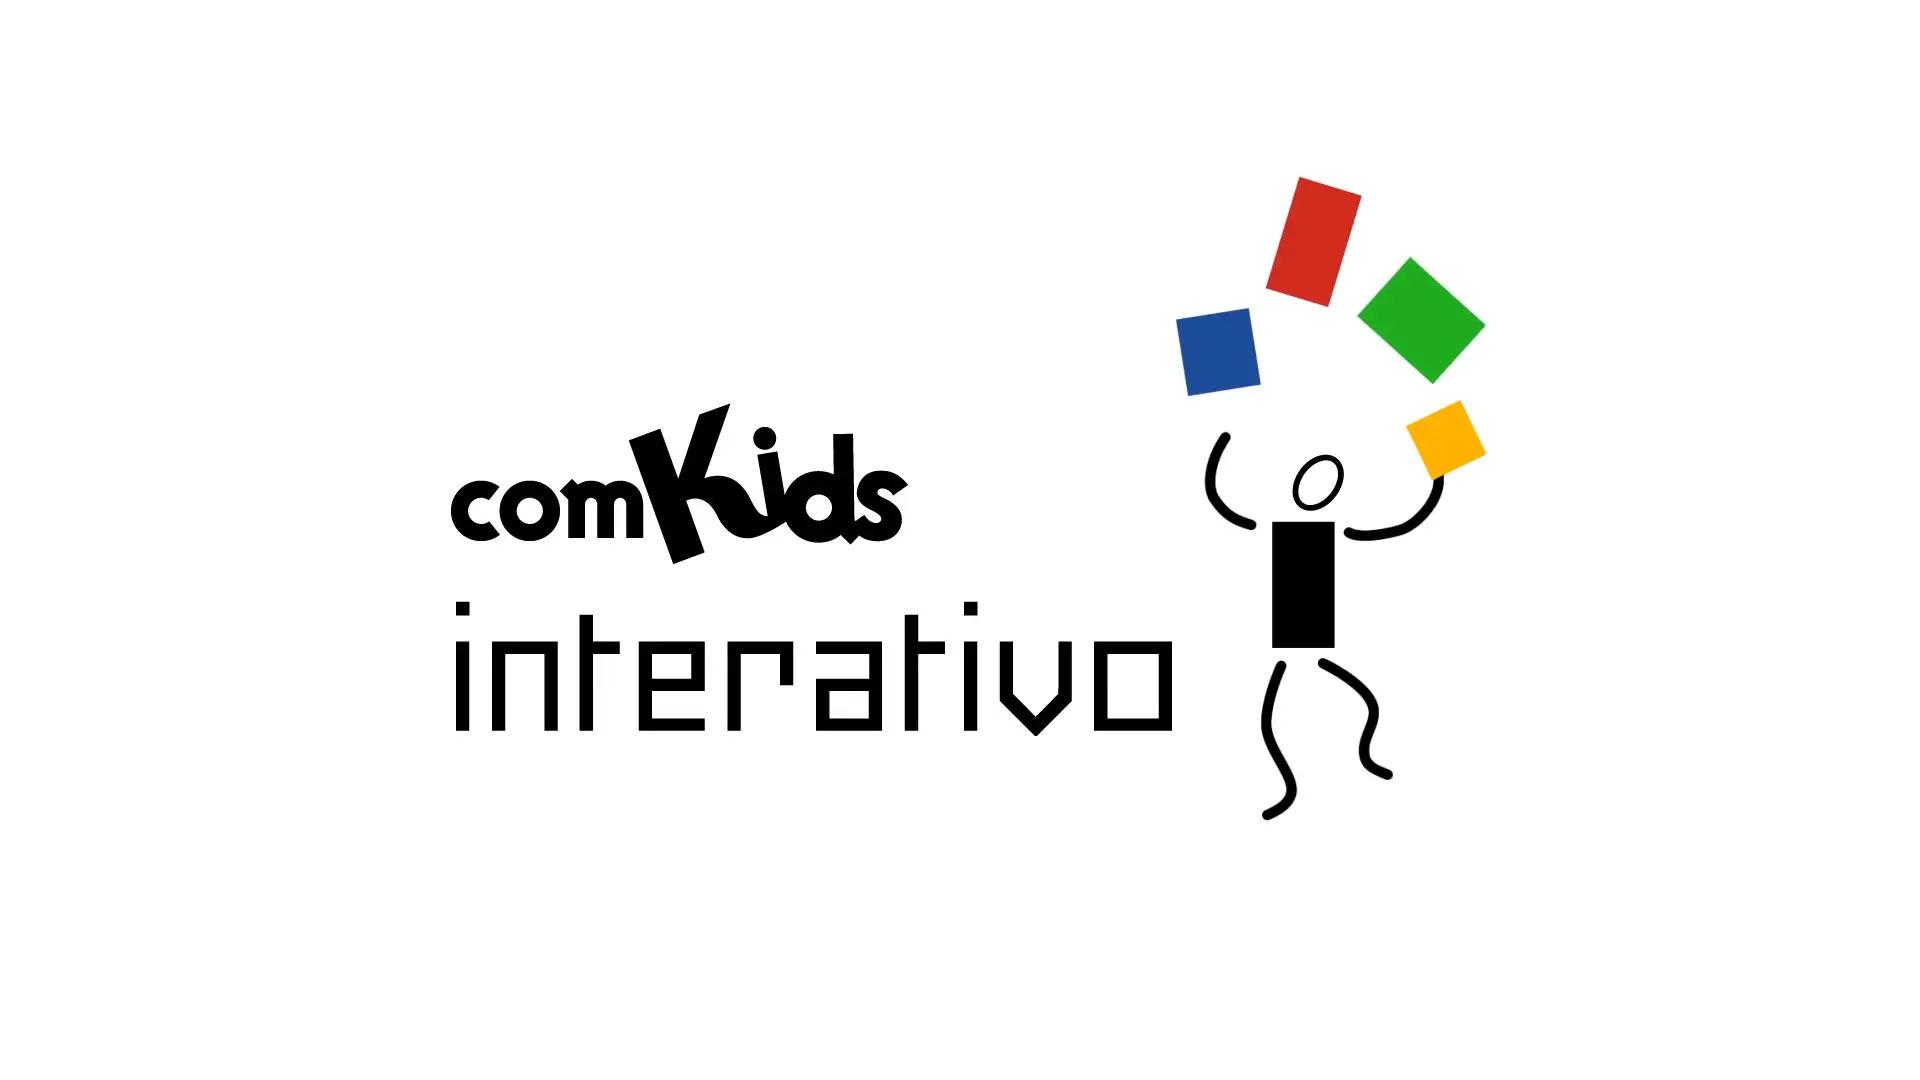 Vinheta Festival Comkids 4  - Mono Animation